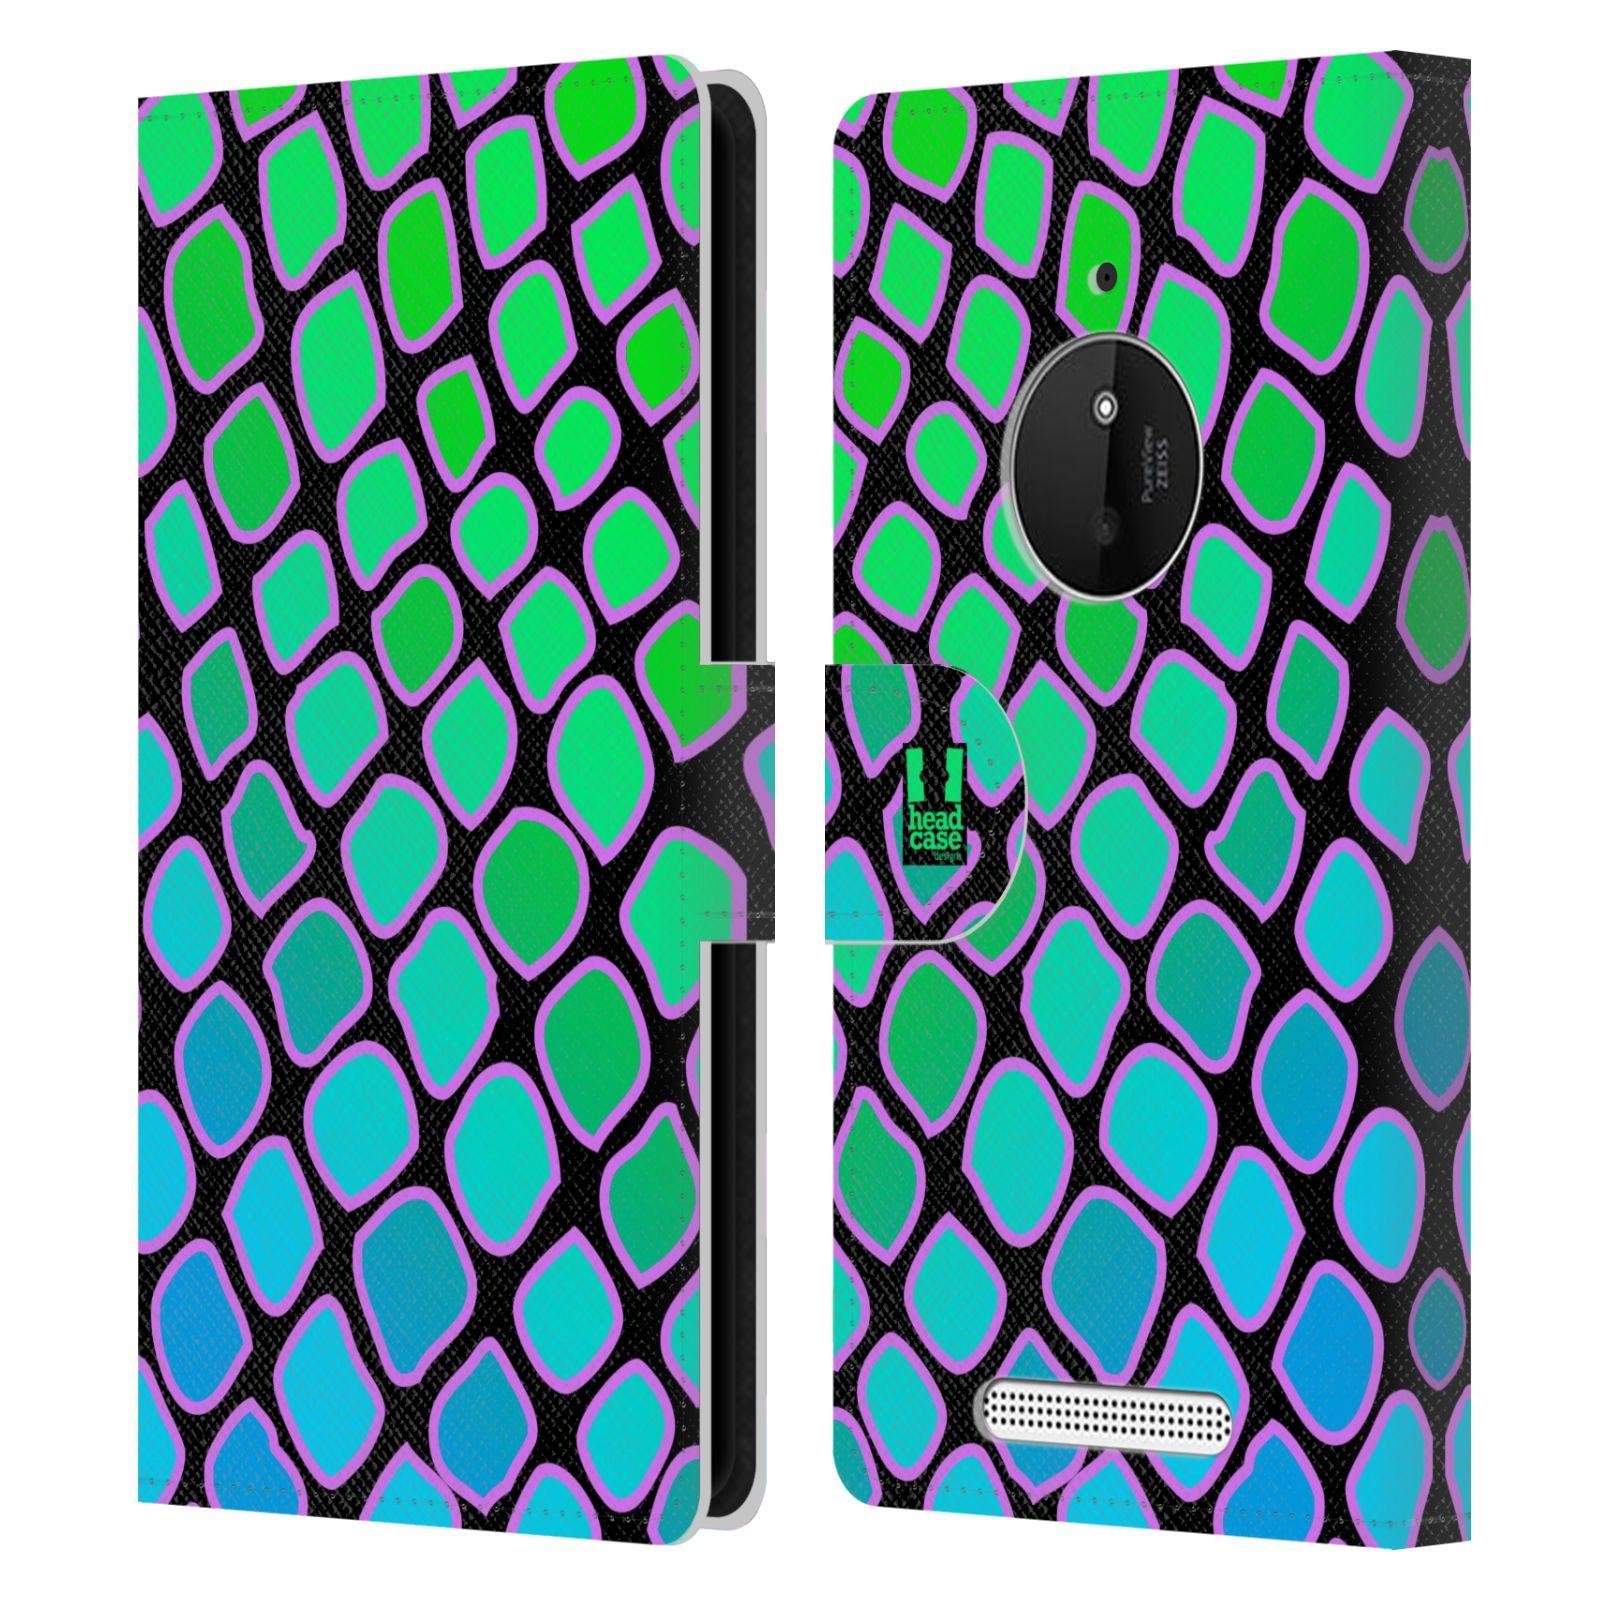 HEAD CASE Flipové pouzdro pro mobil NOKIA LUMIA 830 Zvířecí barevné vzory vodní had modrá a zelená barva AQUA